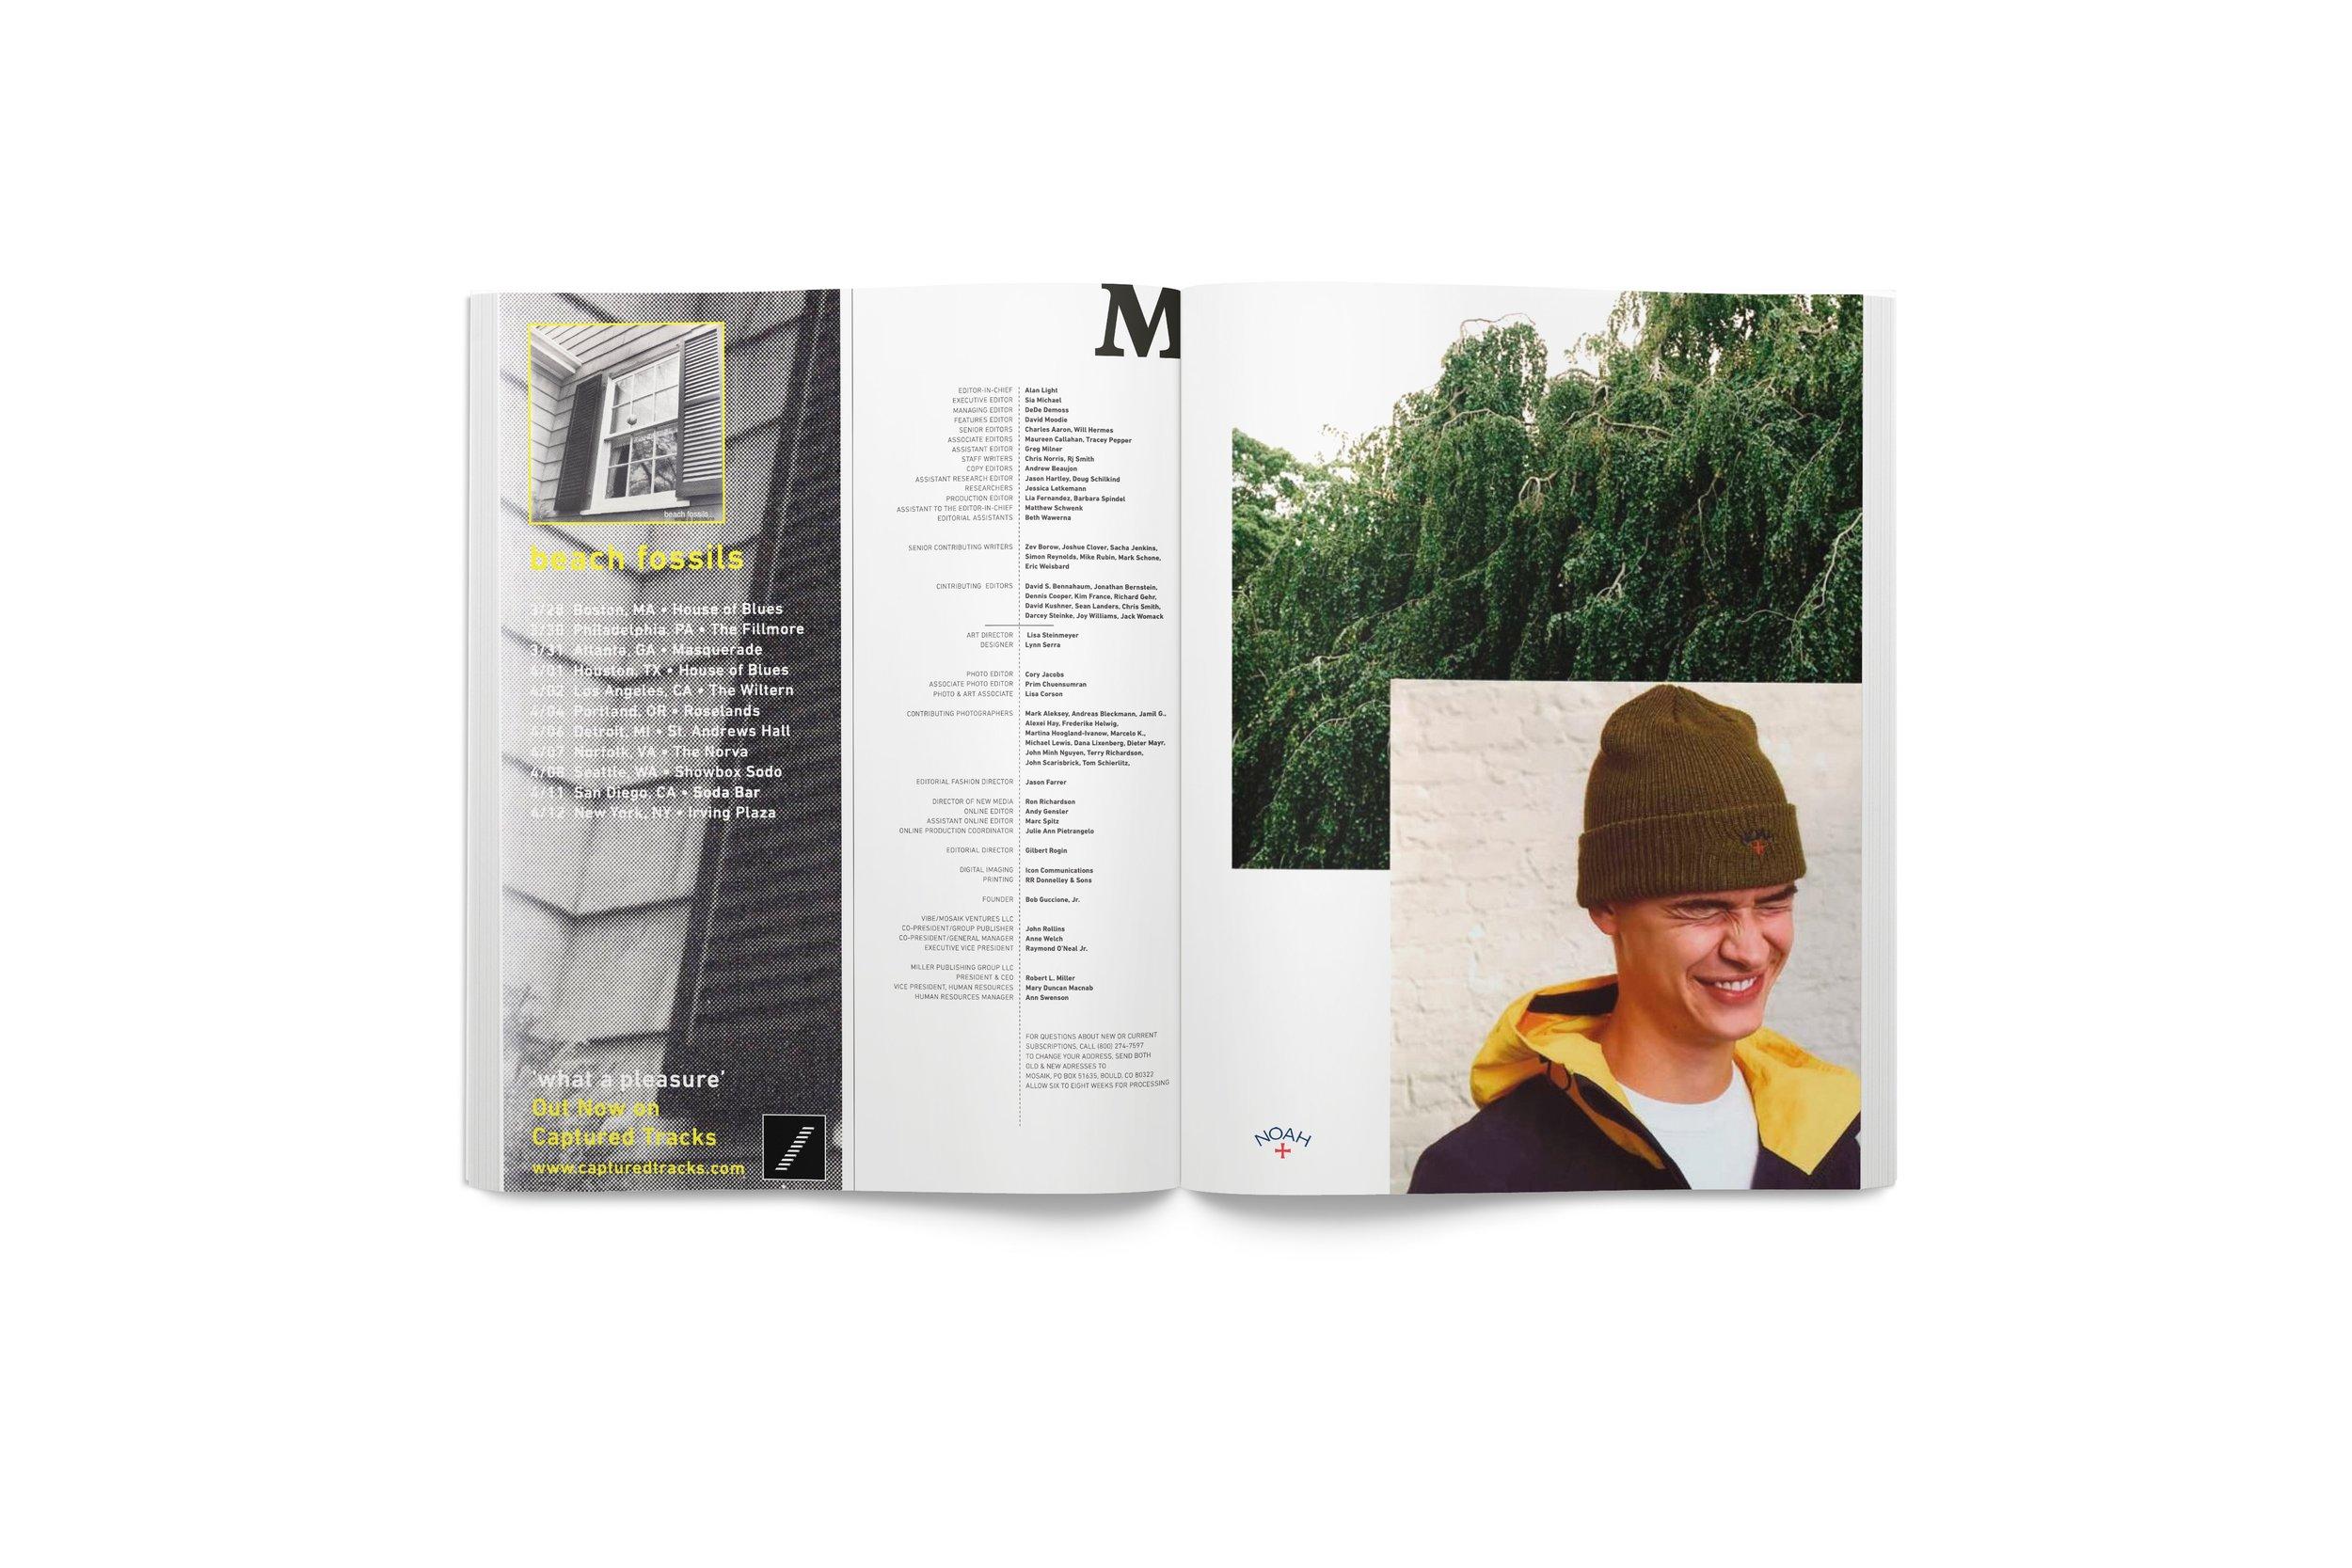 Magazine 0408 2019-03-30 copy.jpeg